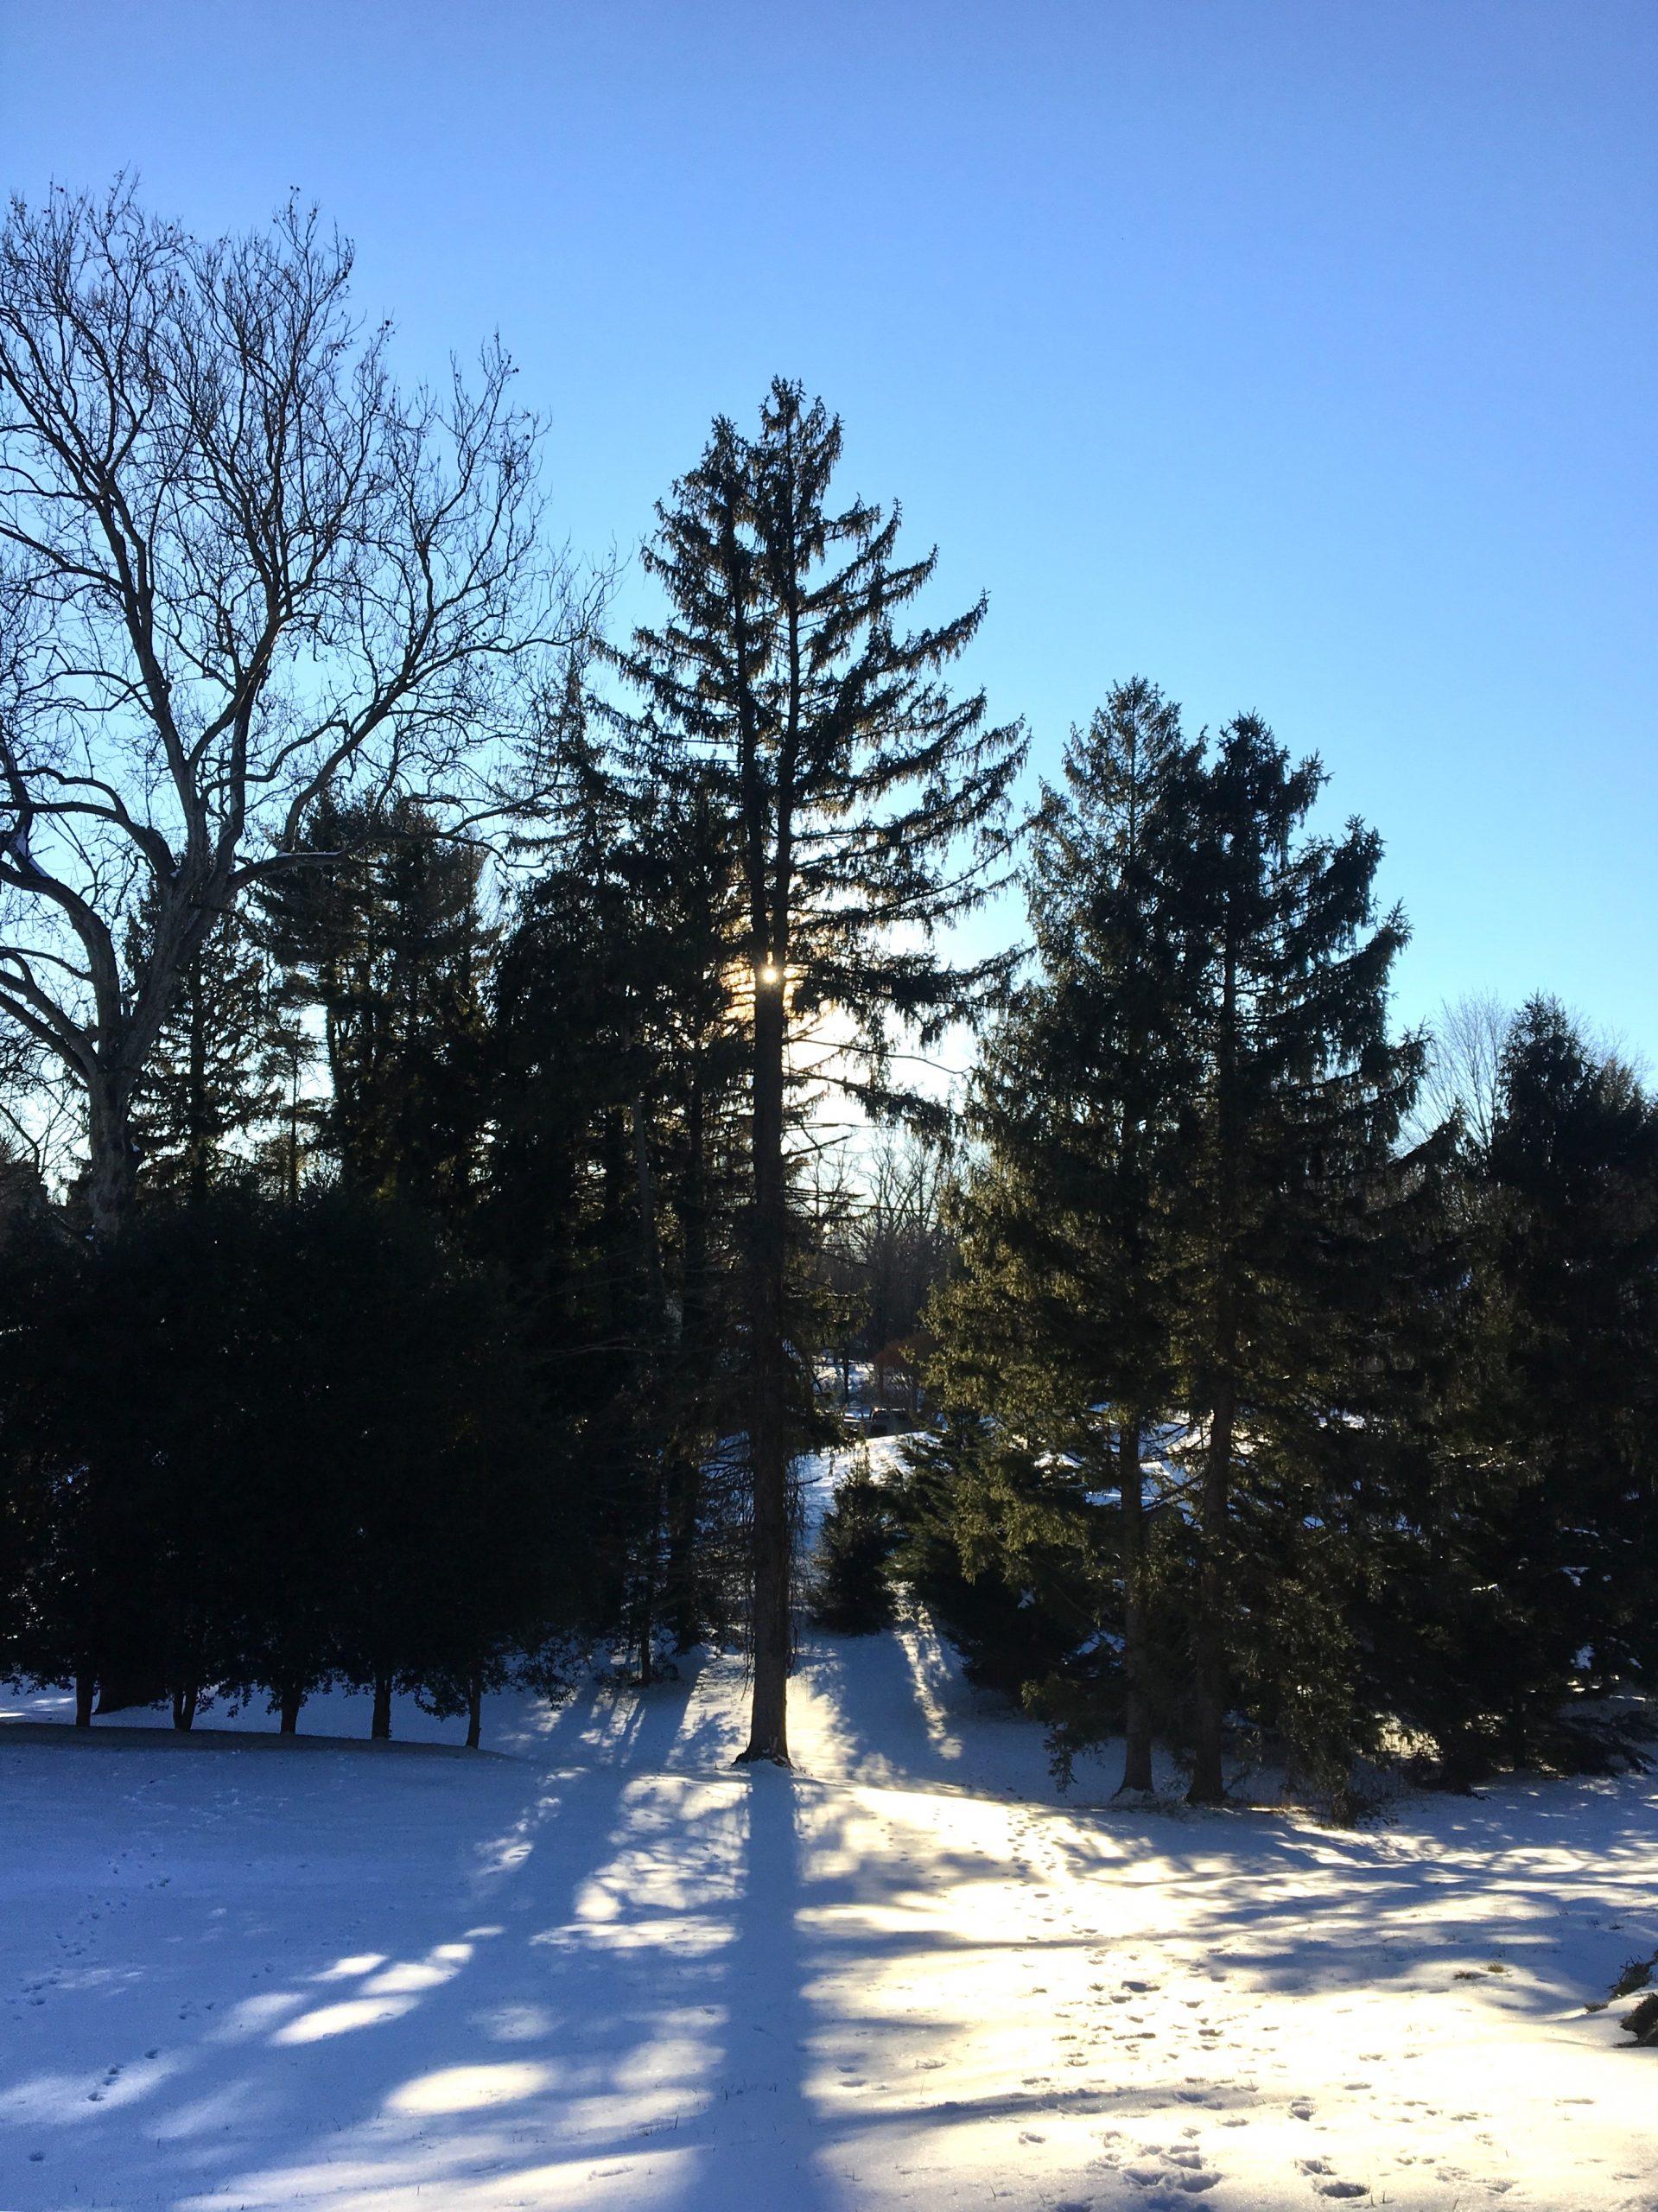 Sunlight throwing long shadows on snow